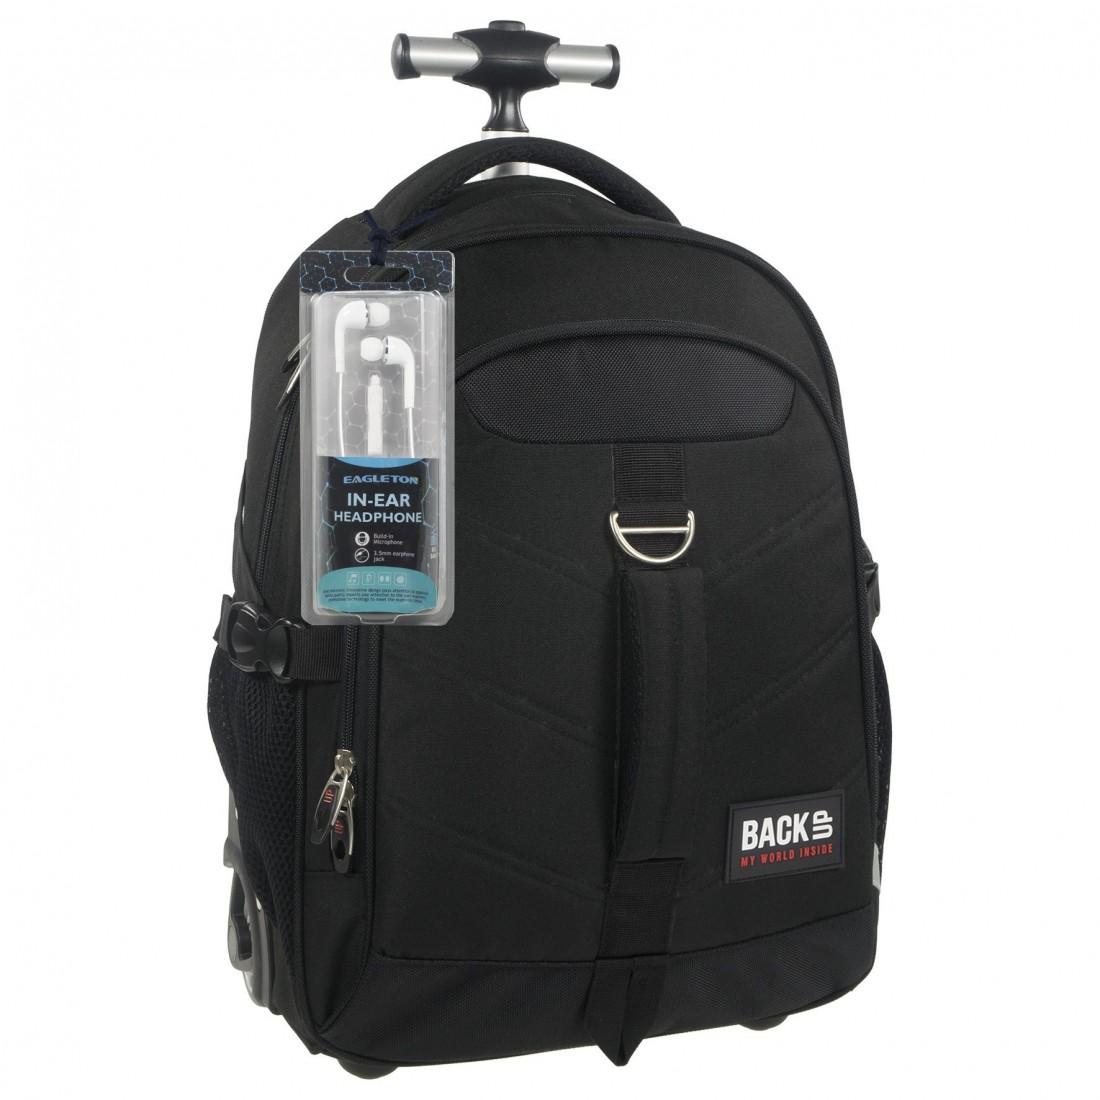 Plecak na kółkach dla chłopaka czarny BackUP K 27 - SŁUCHAWKI gratis - plecak-tornister.pl